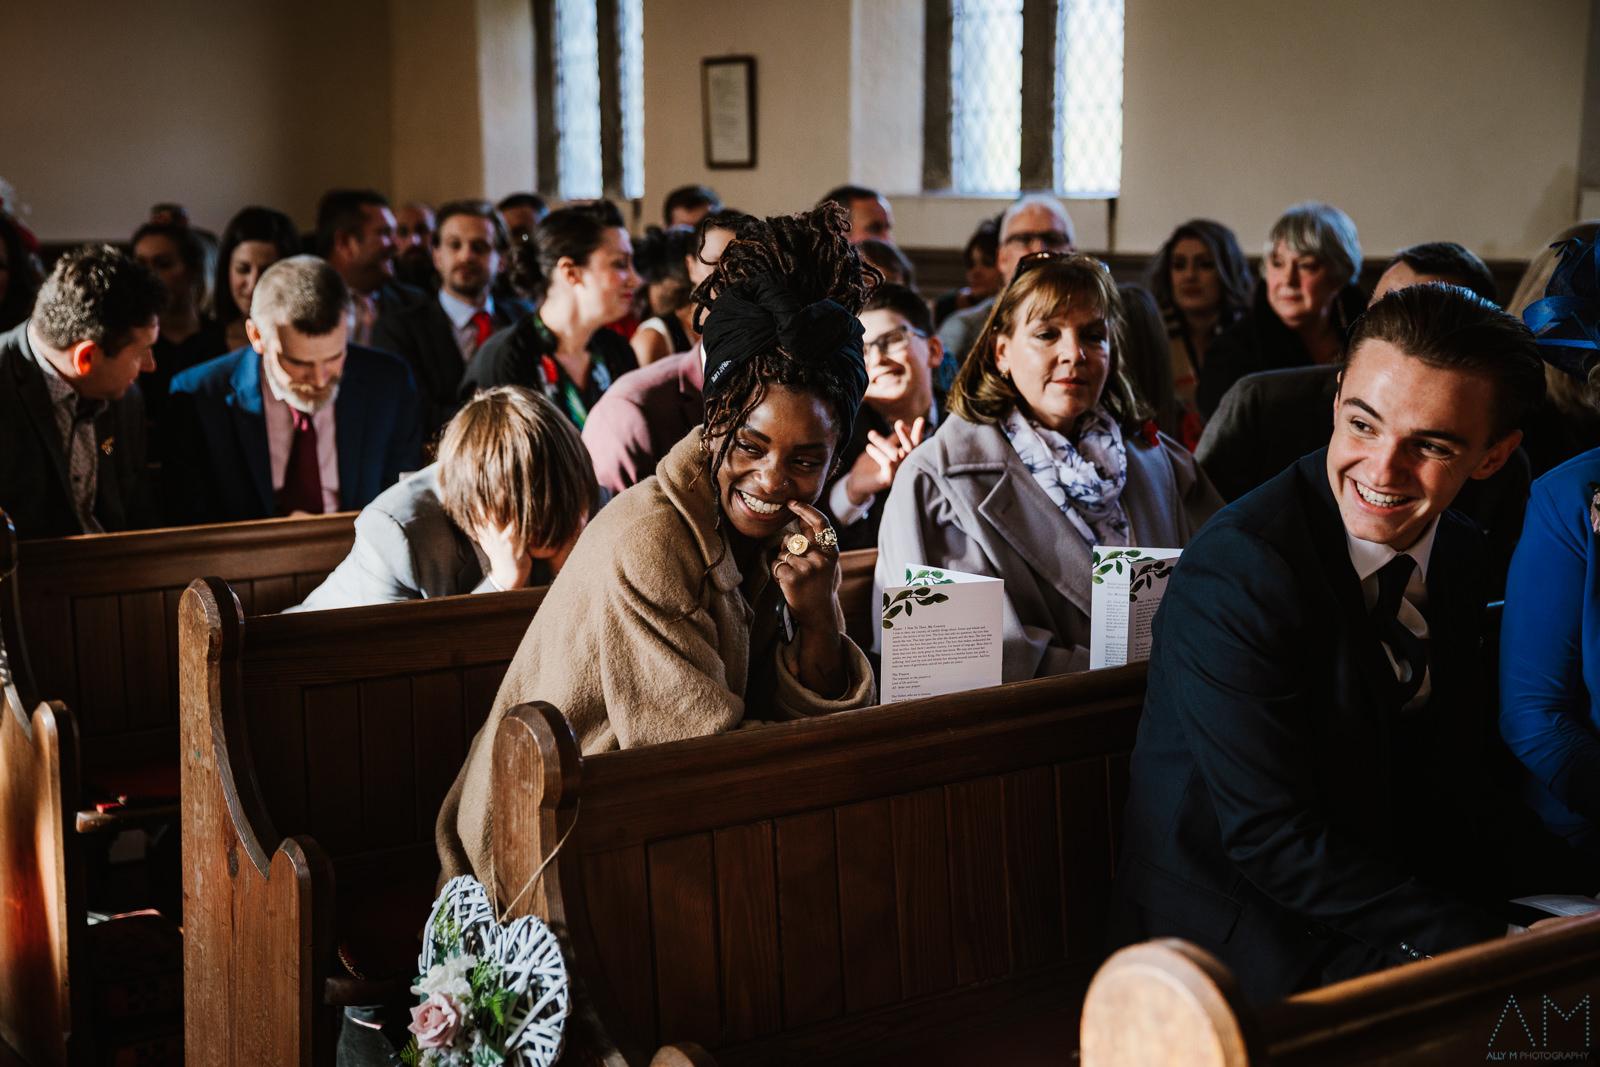 Wedding guest sat in church